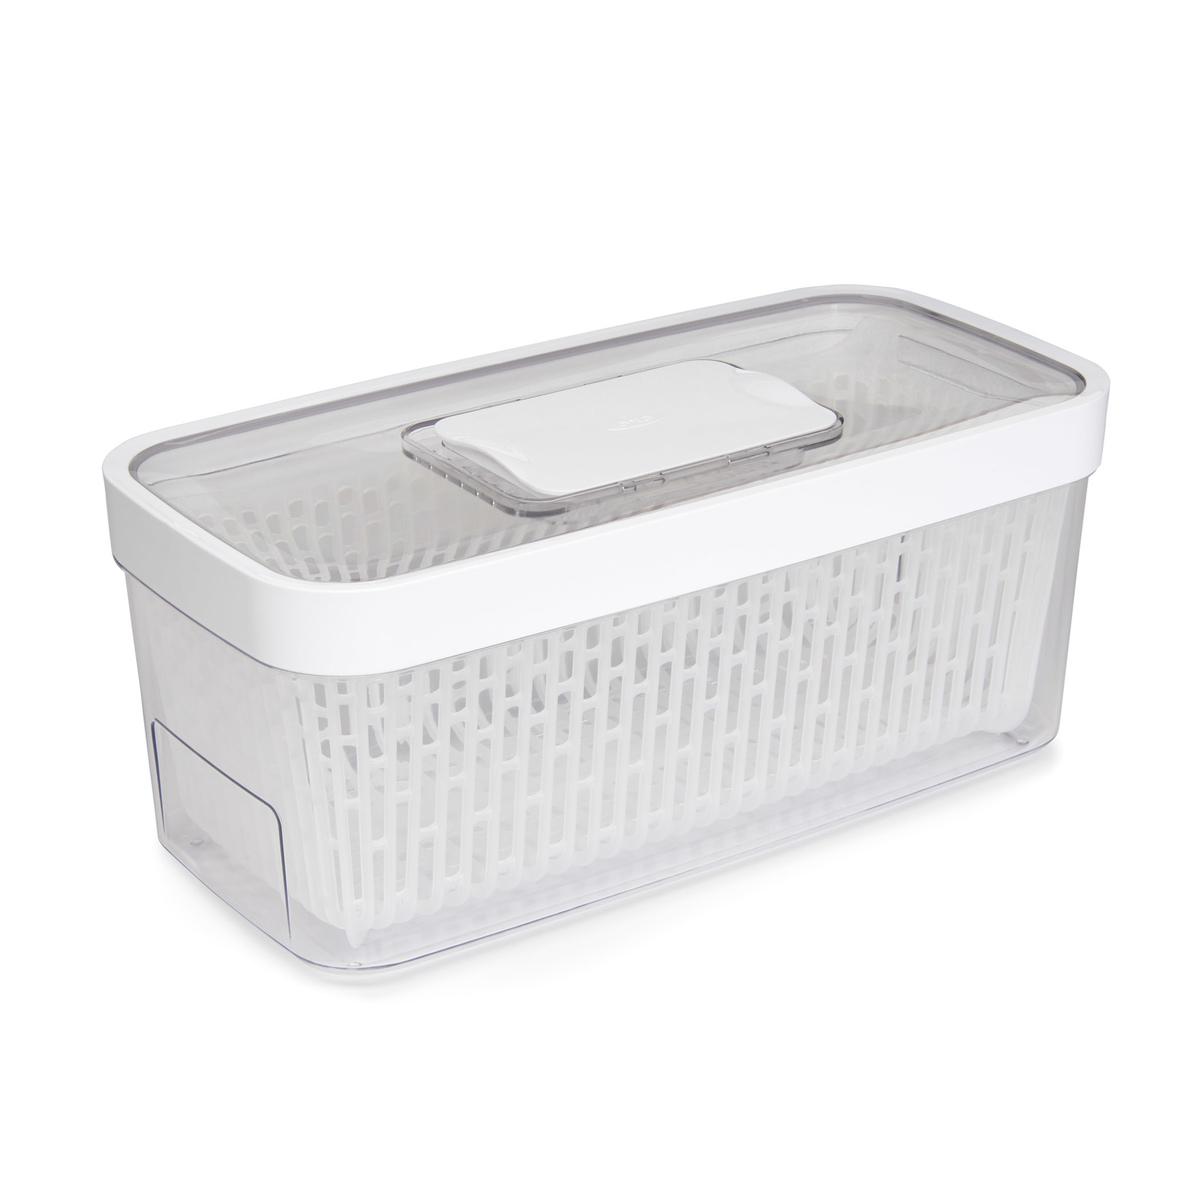 Онлайн каталог PROMENU: Контейнер для хранения с клапаном OXO FOOD STORAGE, 16х33х14 см, белый                               11140100